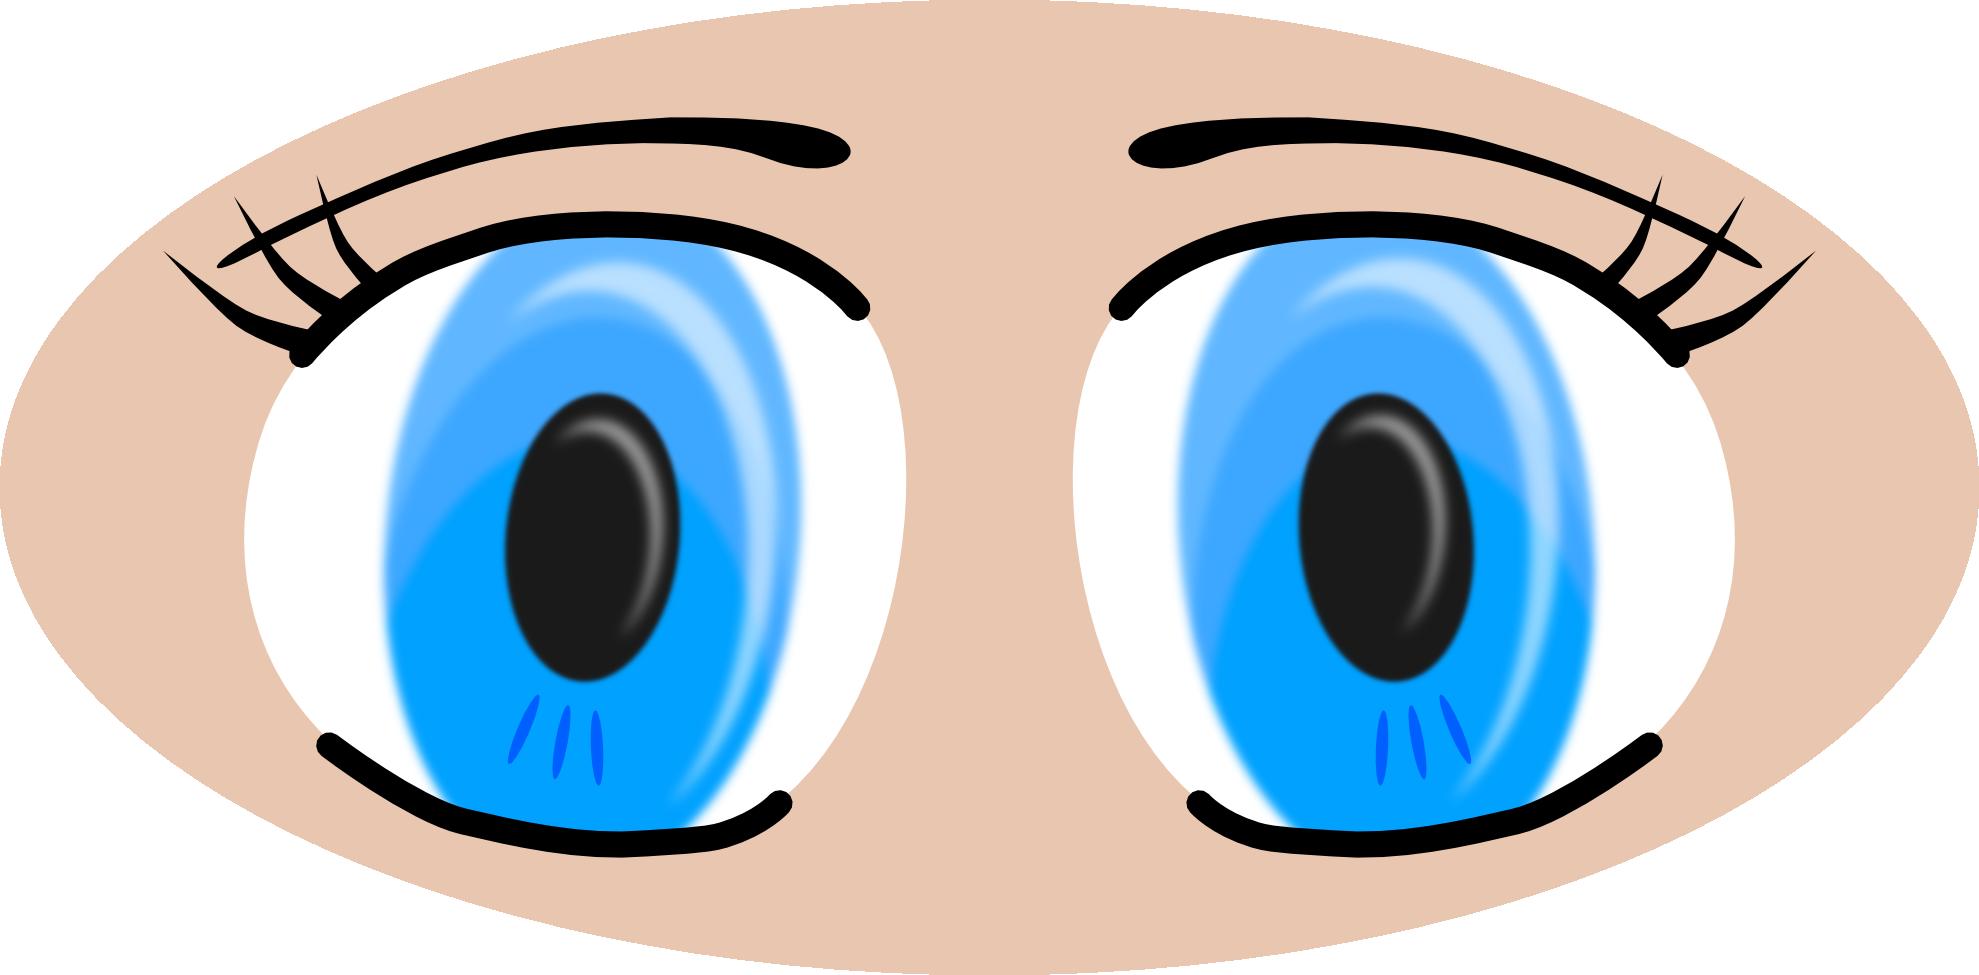 Clipart eye cobra. Scary eyes at getdrawings